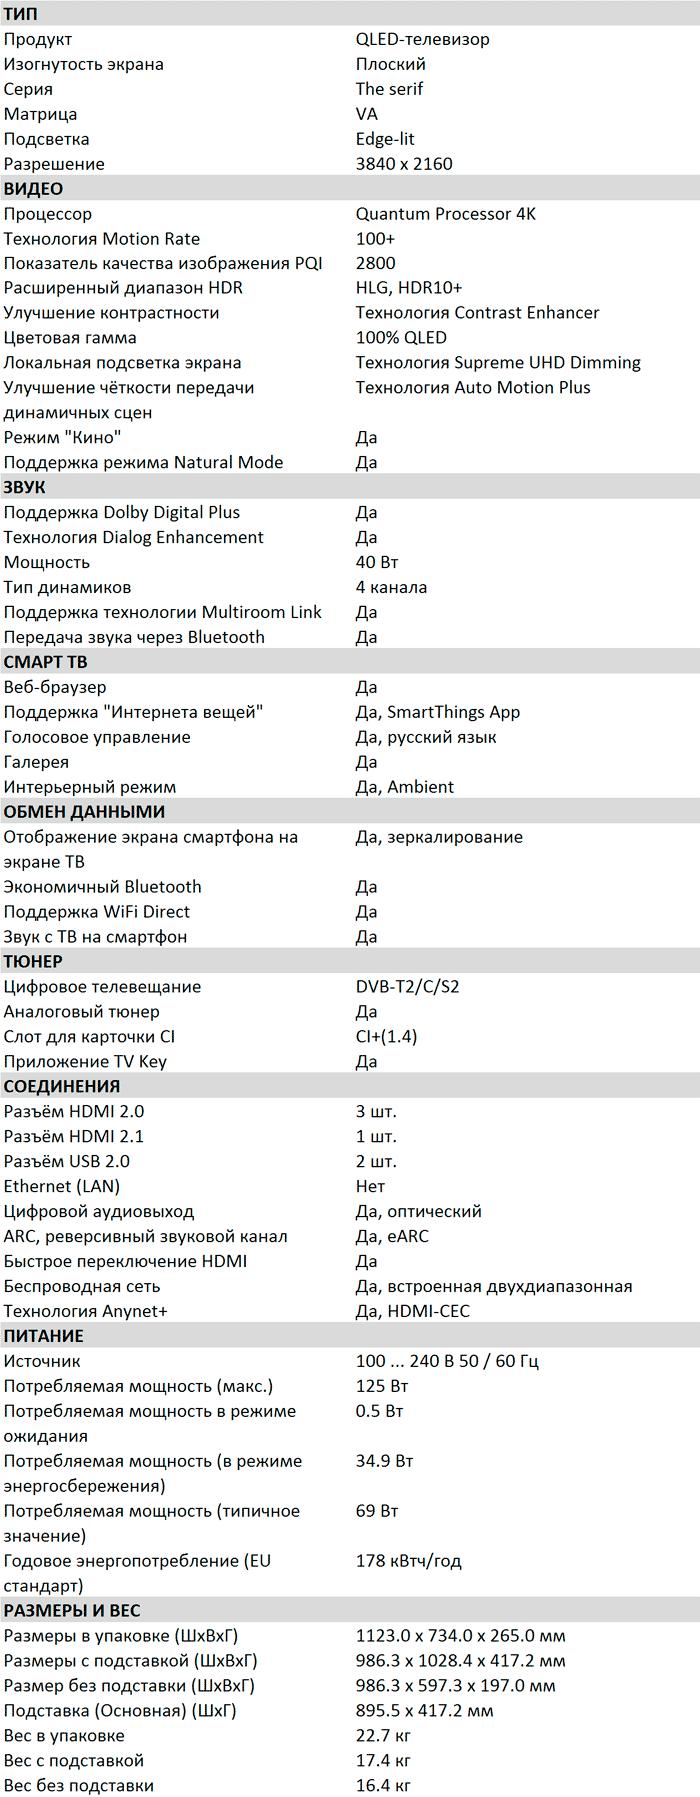 Характеристики LS01T